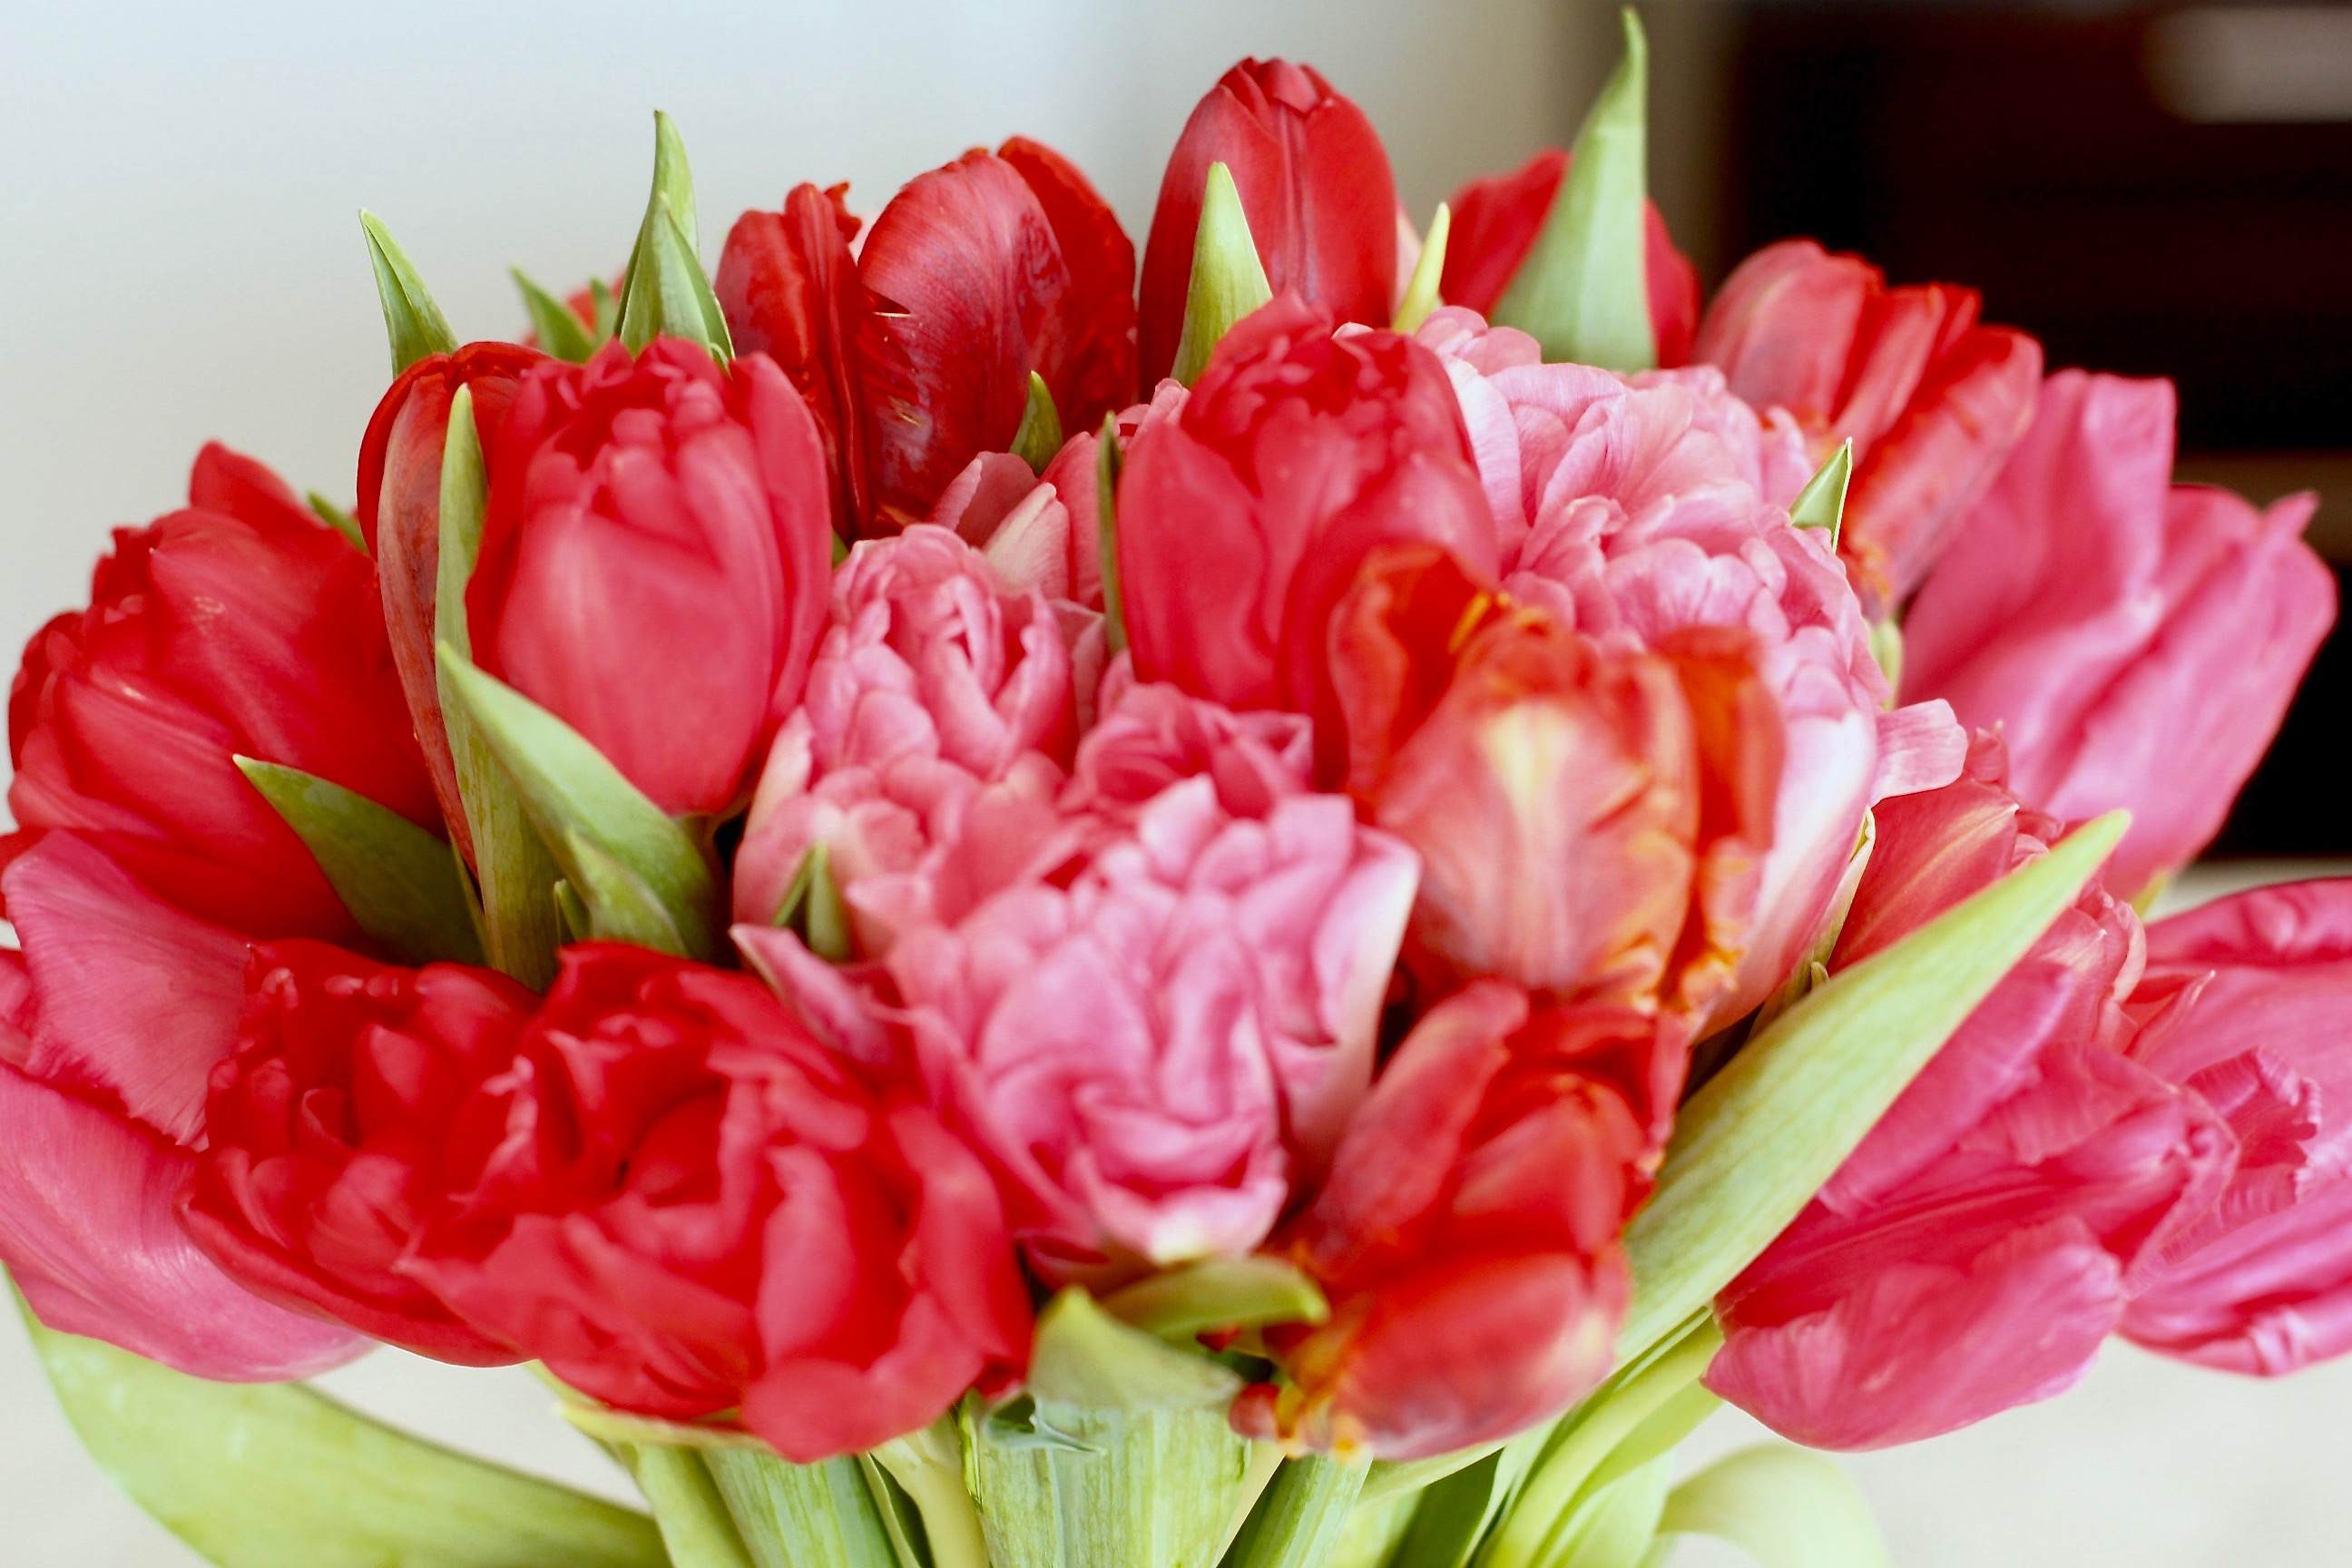 missyonmadison, melissa tierney, ftd flowers, valentines day, vday, vday 2016, valentines day 2016, roses, tulips, valentines day flowers, inspiration, inspiring women, la blogger, fashion blogger, fashion blog, it cosmetics, ulta beauty, vday makeup, valentines day cosmetics, valentines day makeup, valentines day m&ms,